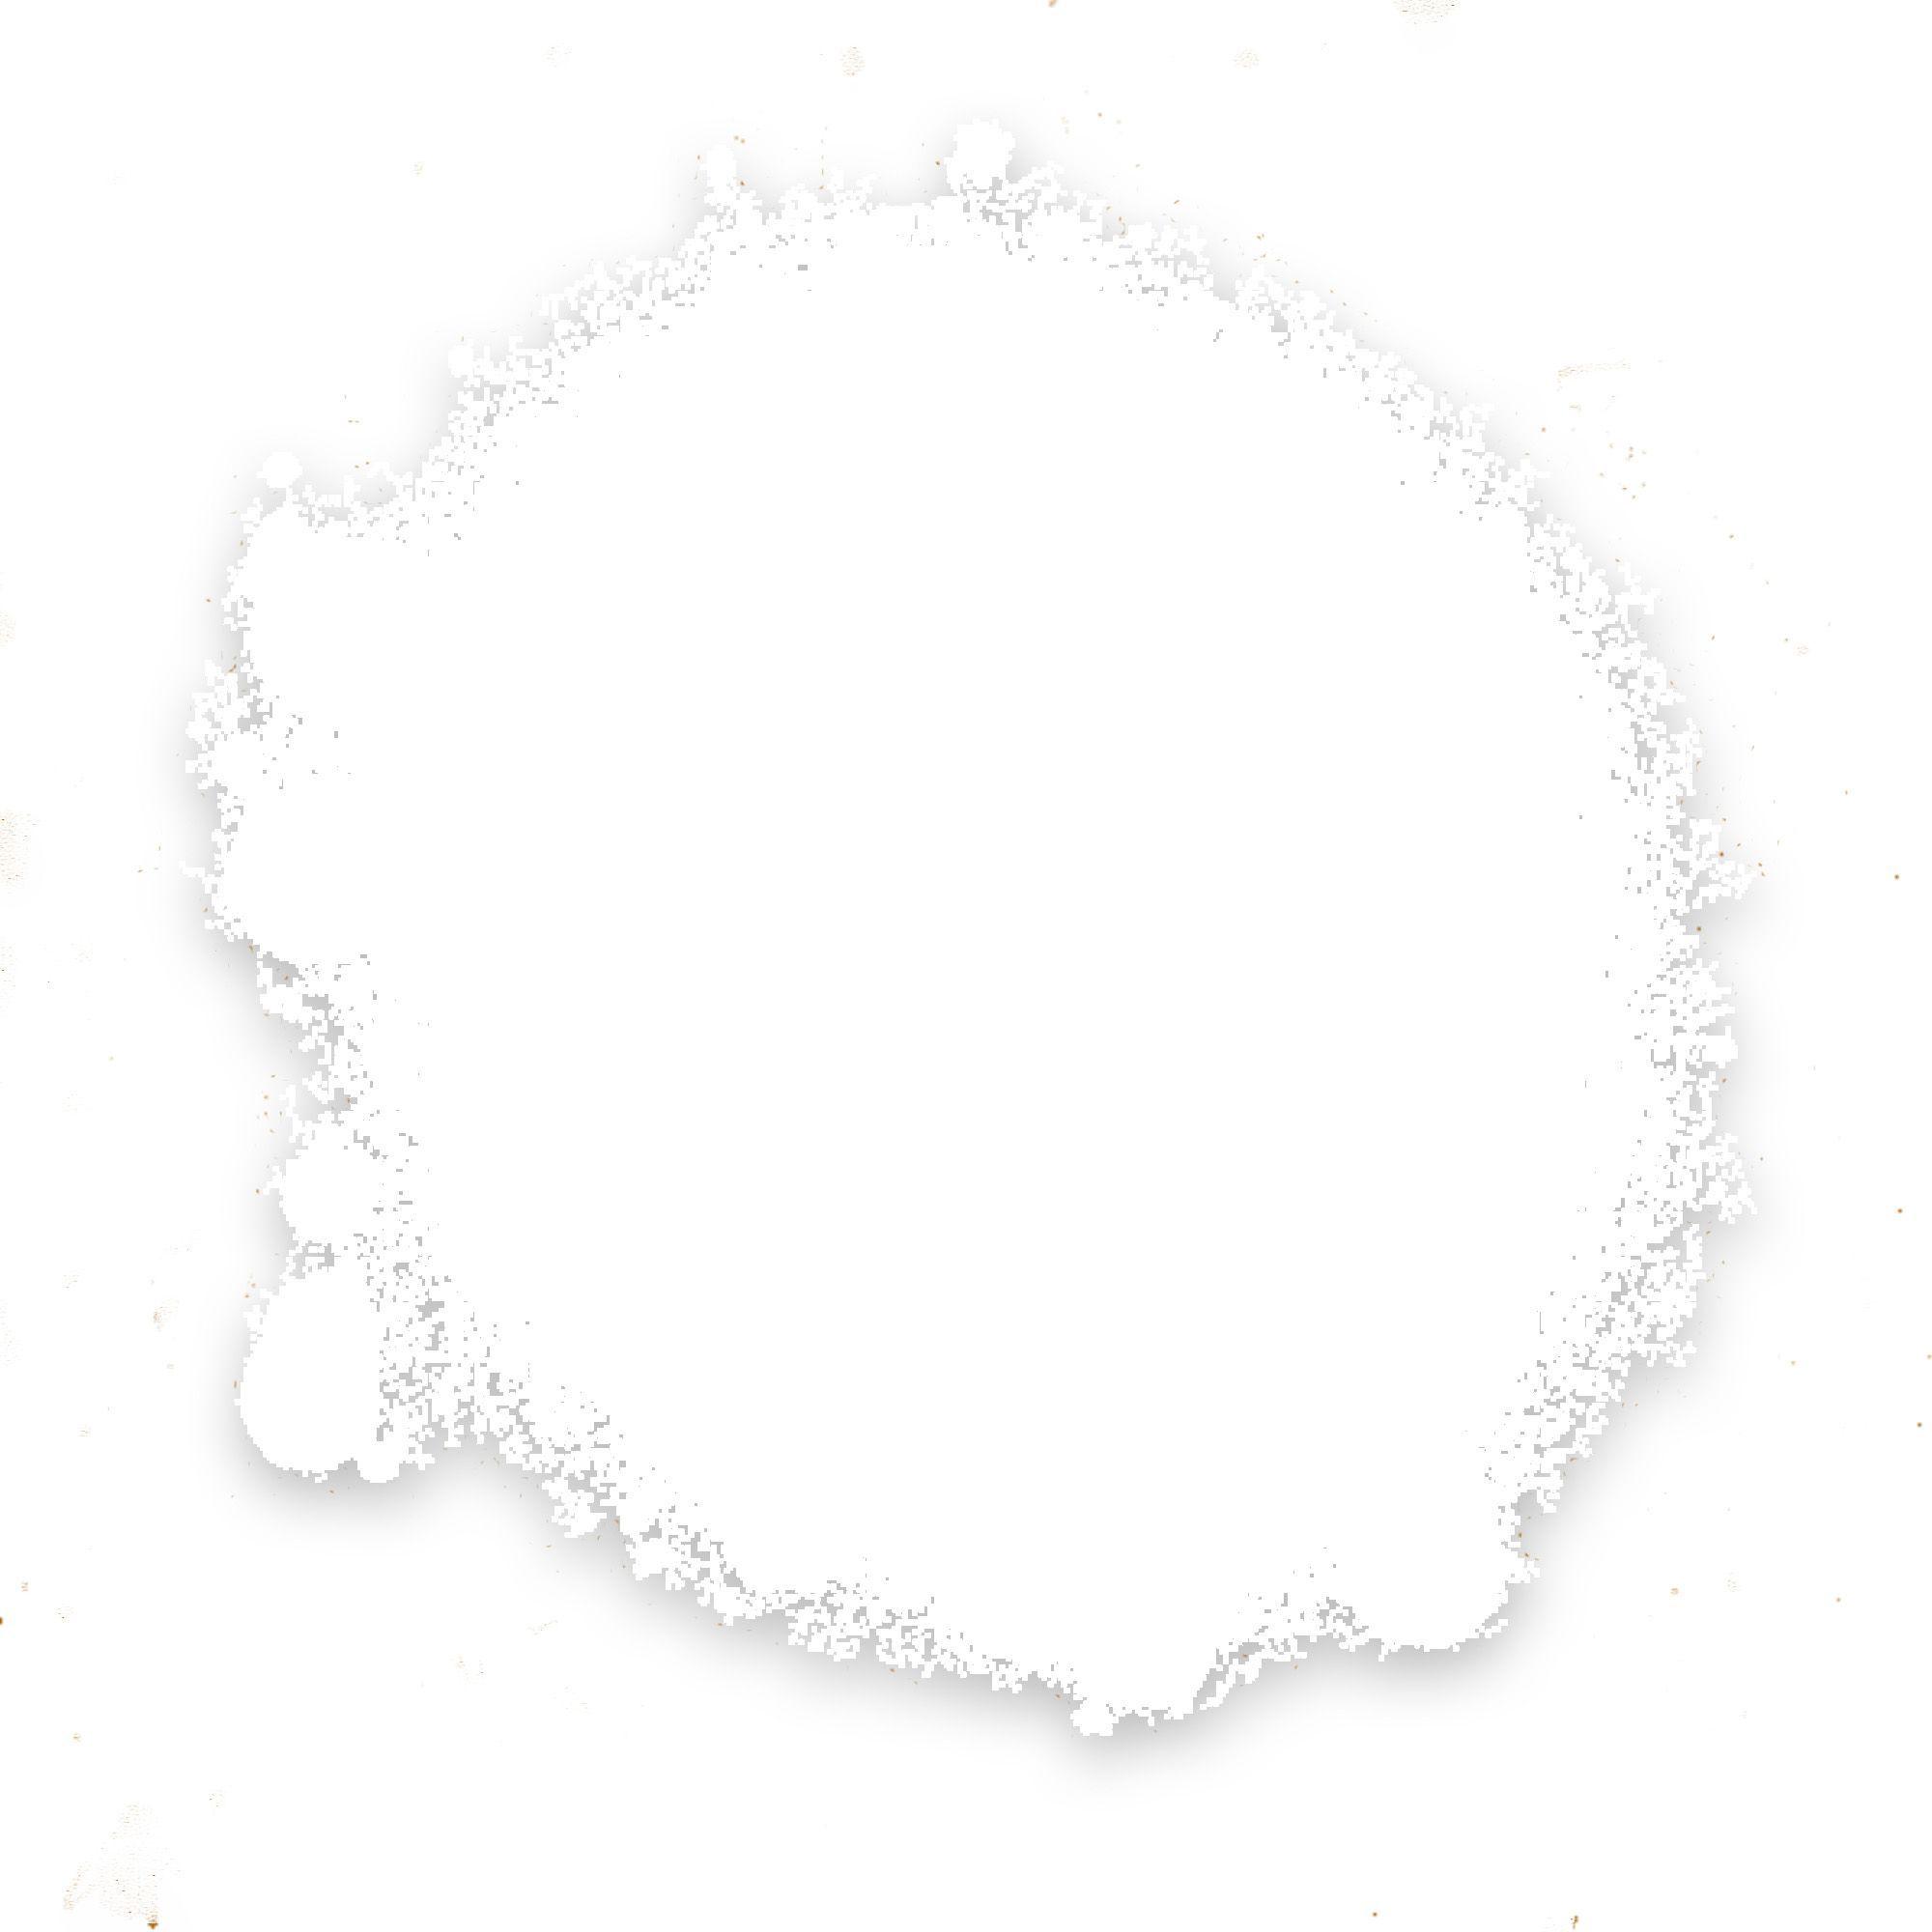 Plasti Kote White Gloss Enamel Spray Paint 100 Ml